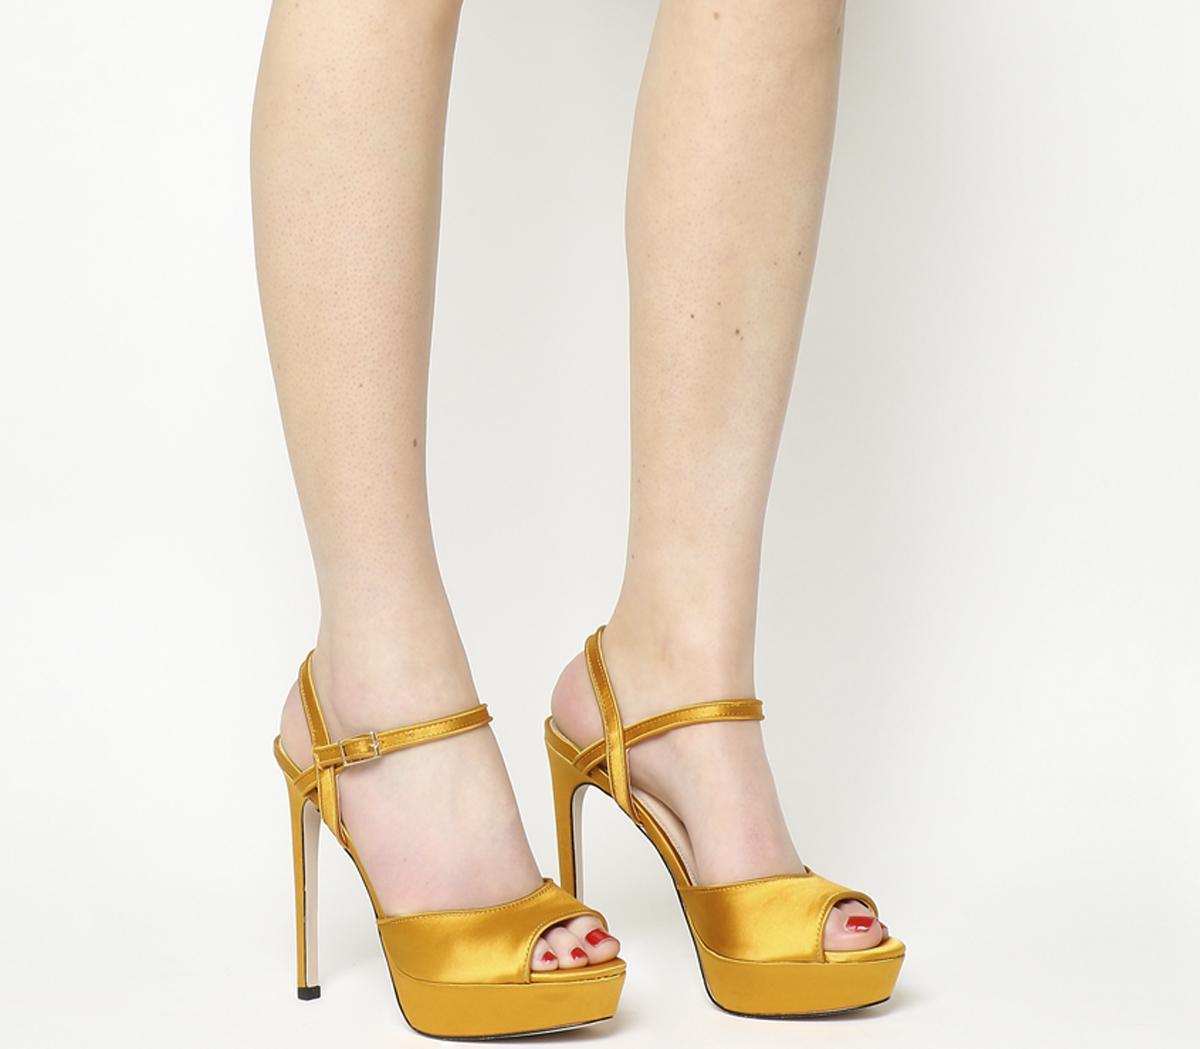 dab09ab0972 Office Hoop Platform Heels Mustard Yellow Satin - High Heels